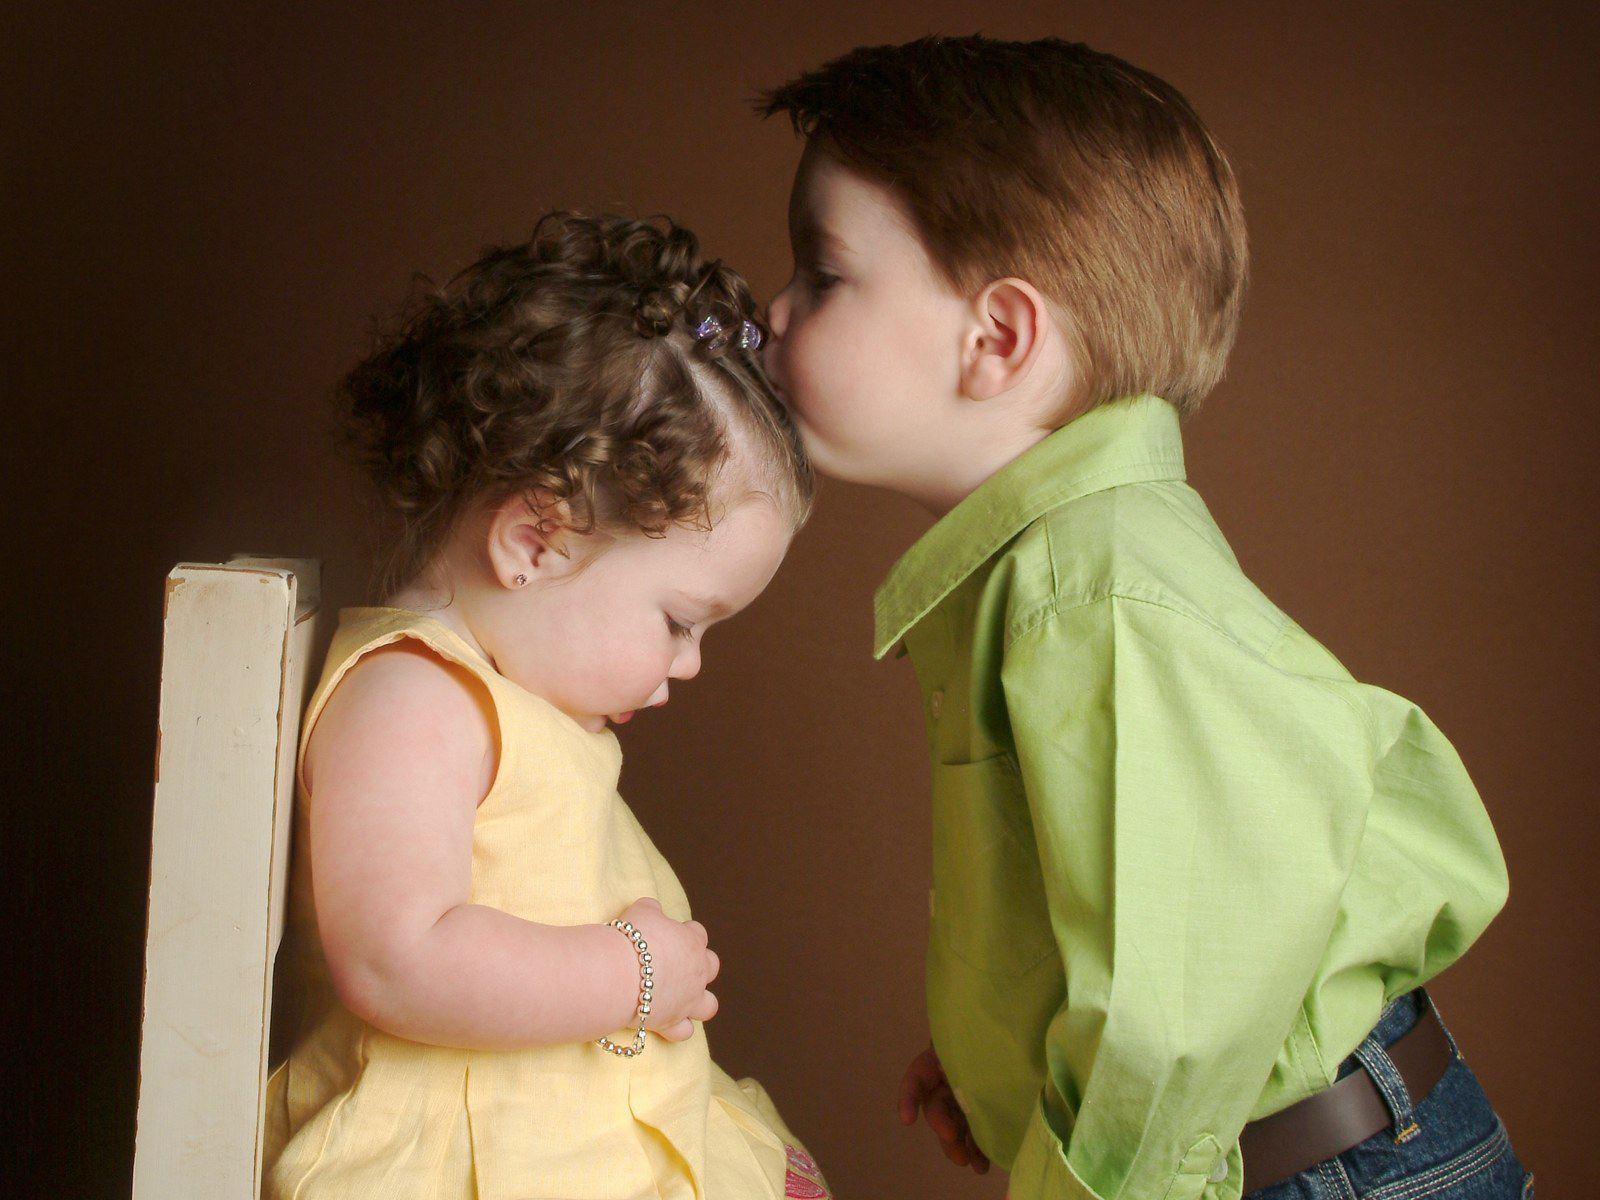 Beutifull cute hd wallpapers baby kiss desktop dounlod full hd hd wallpaper baby kids kiss hdwallpaper kiss kids baby kids hd photos hd voltagebd Gallery